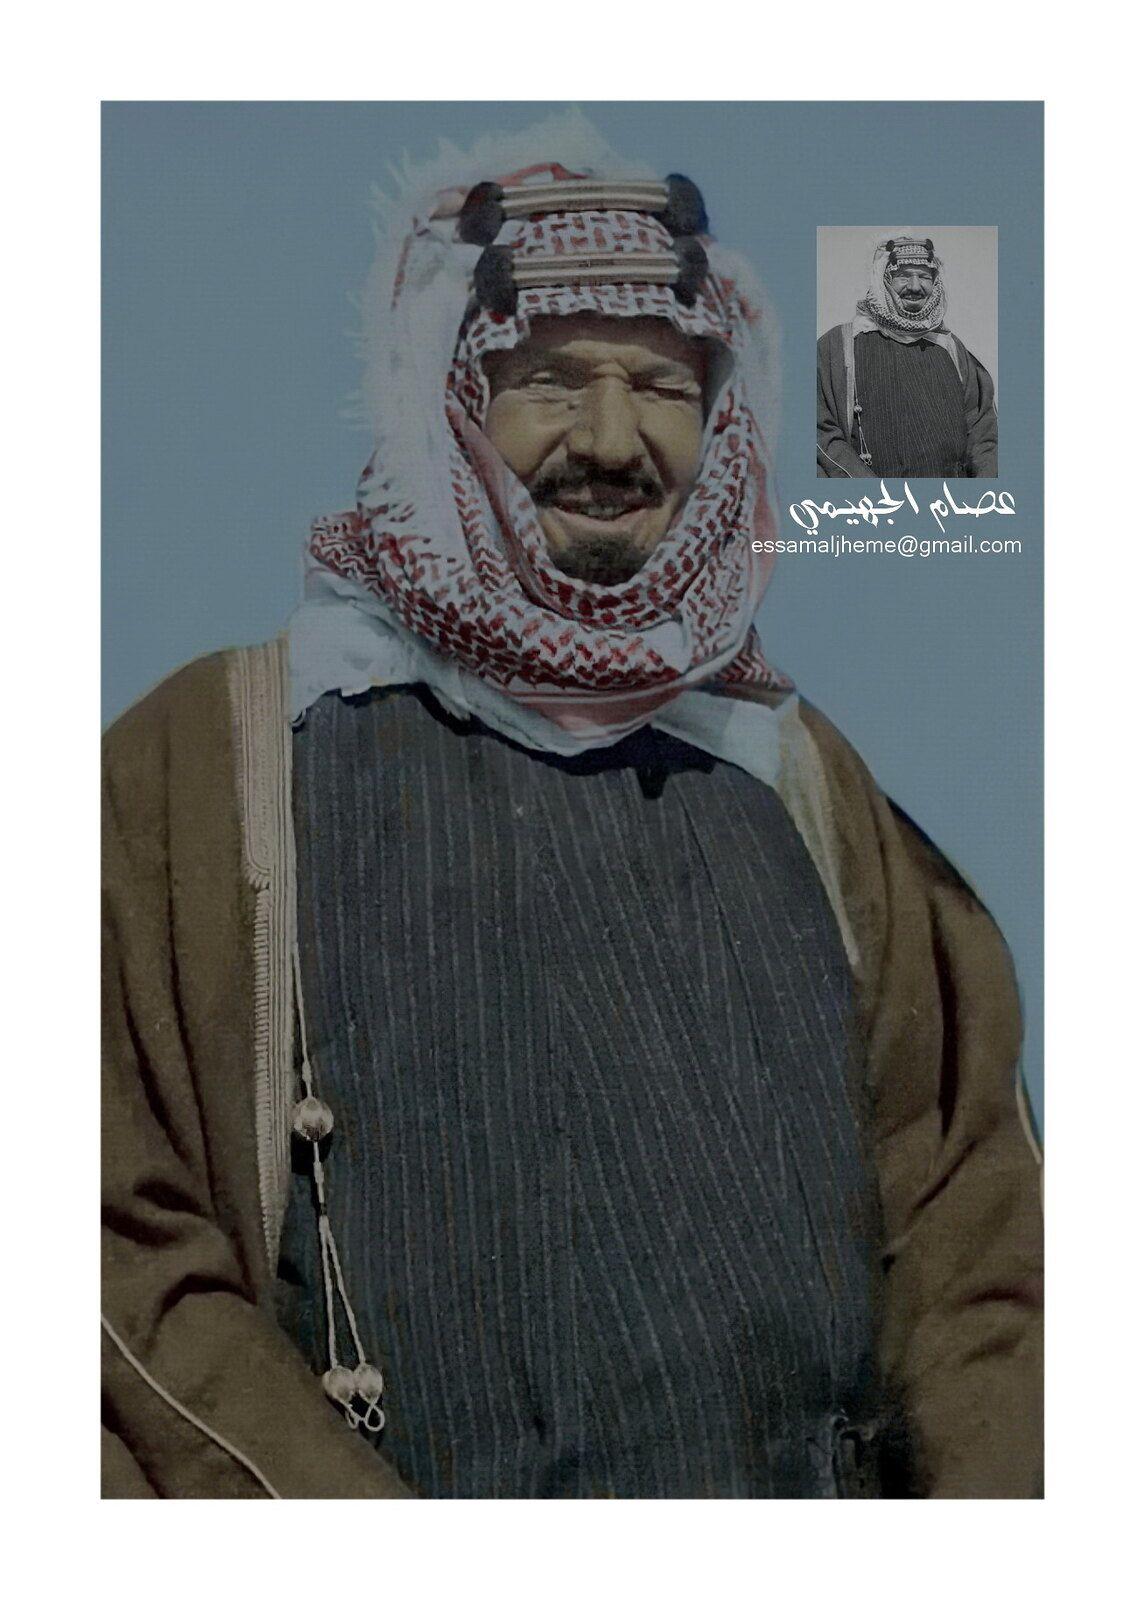 الملك عبدالعزيز بن عبدالرحمن ال سعود Saudi Arabia Culture Rare Pictures Cast Stranger Things